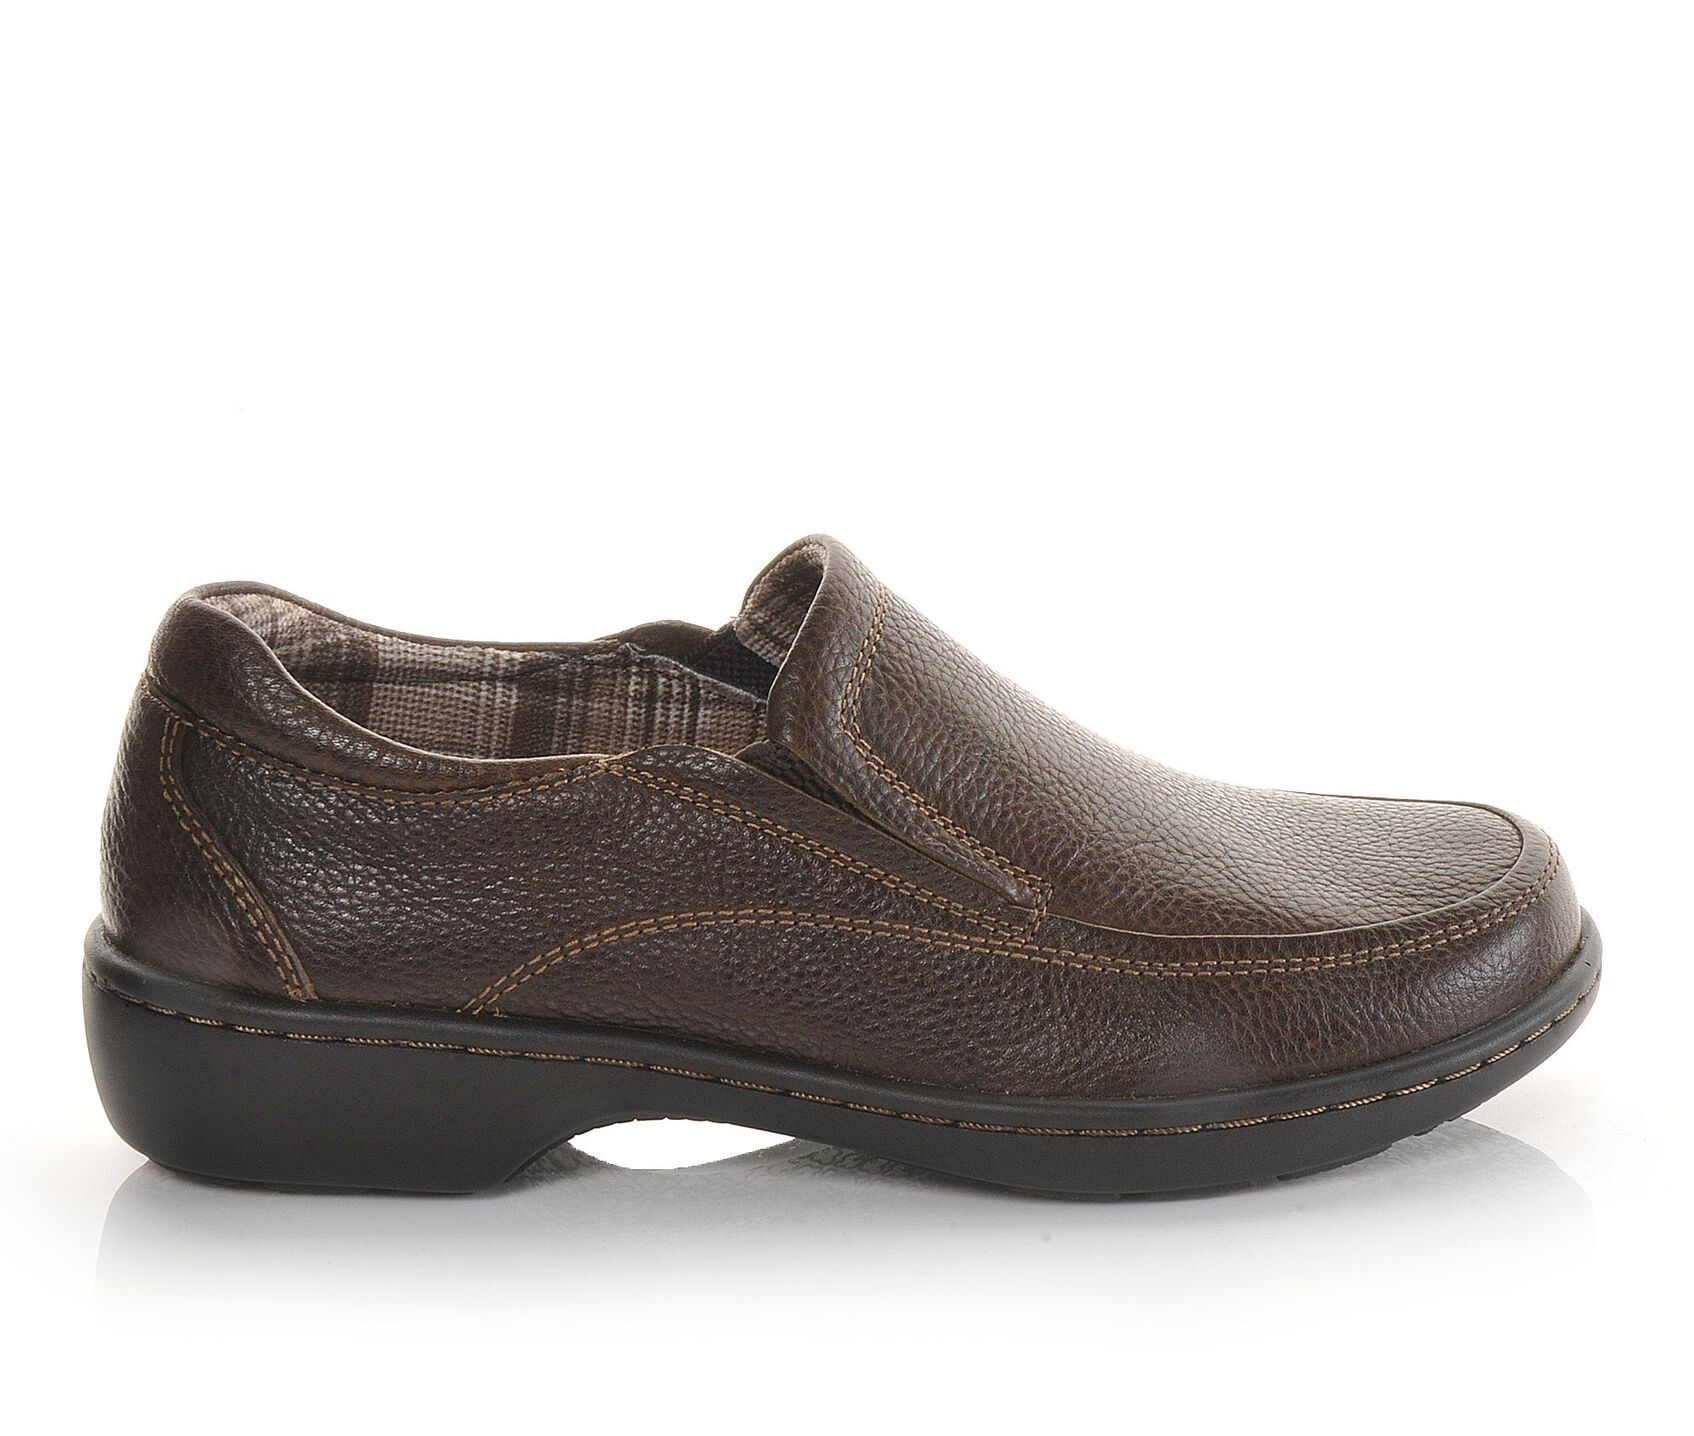 Shoe Carnival Womens Loafers